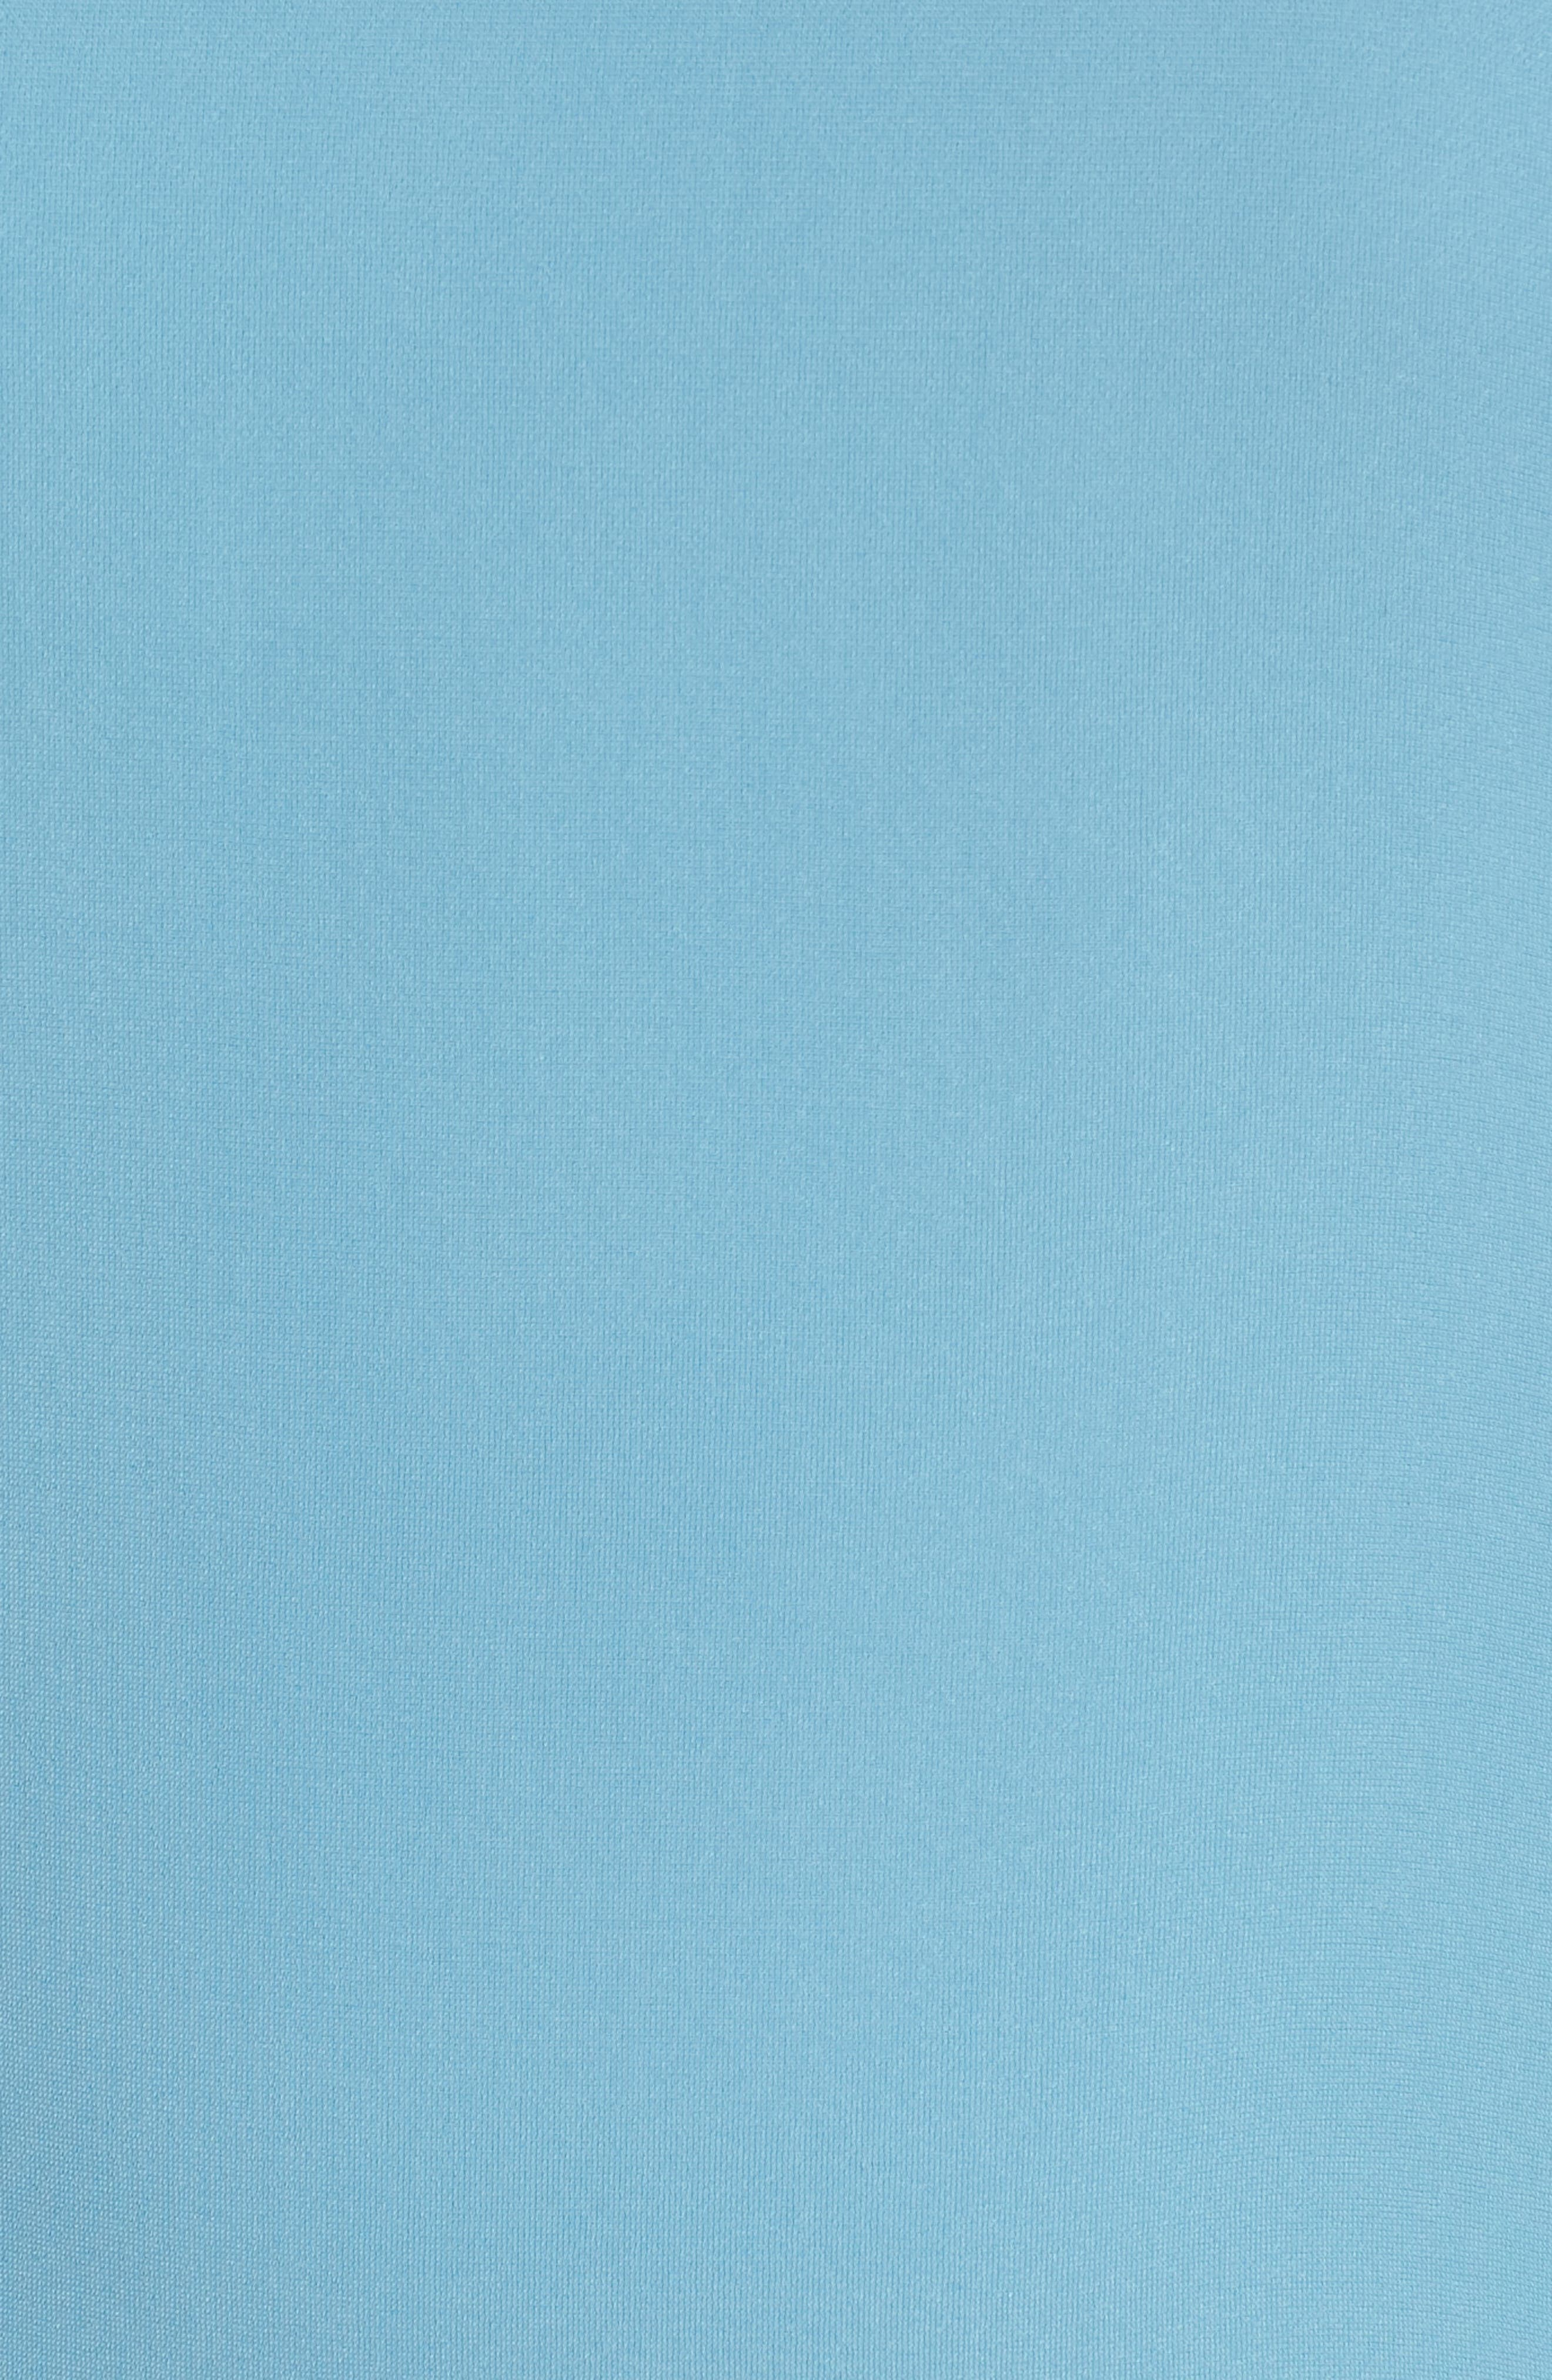 Galaxy Waters Ruffle Sleeve Shift Dress,                             Alternate thumbnail 5, color,                             422